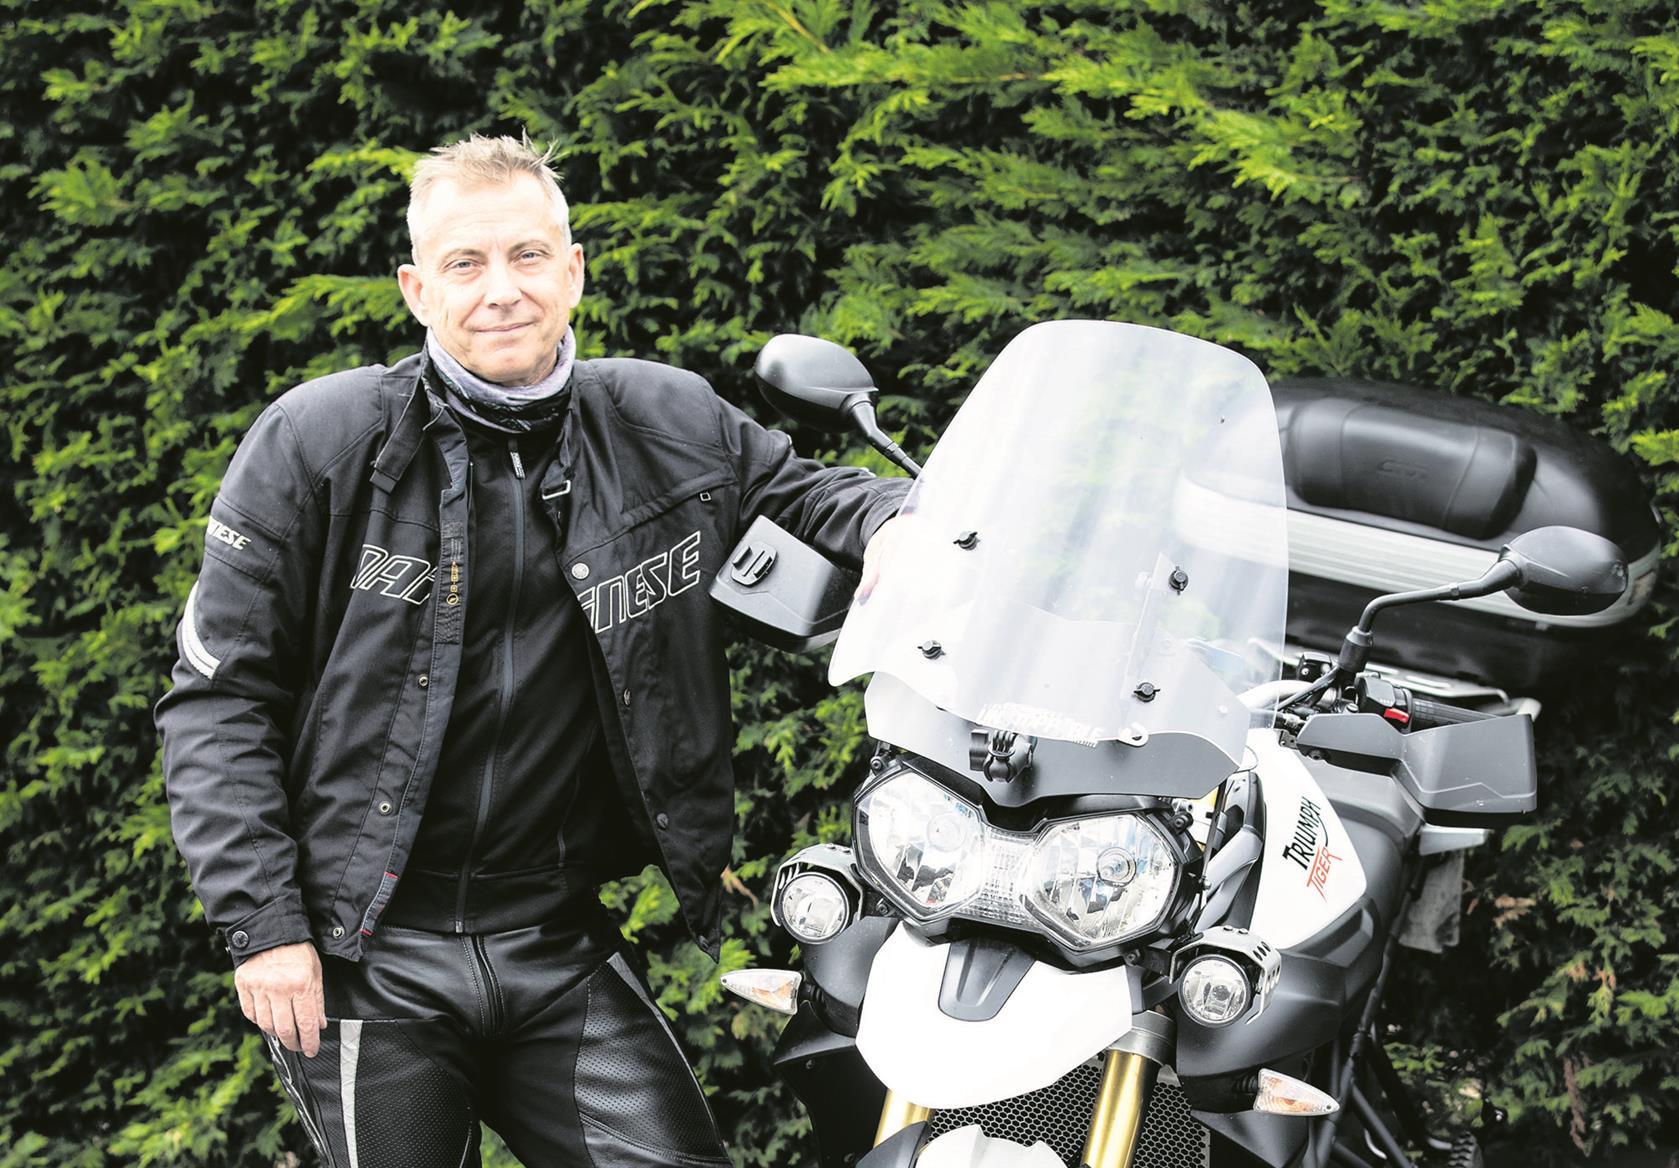 Mark Bayford: 'It's a great social scene'